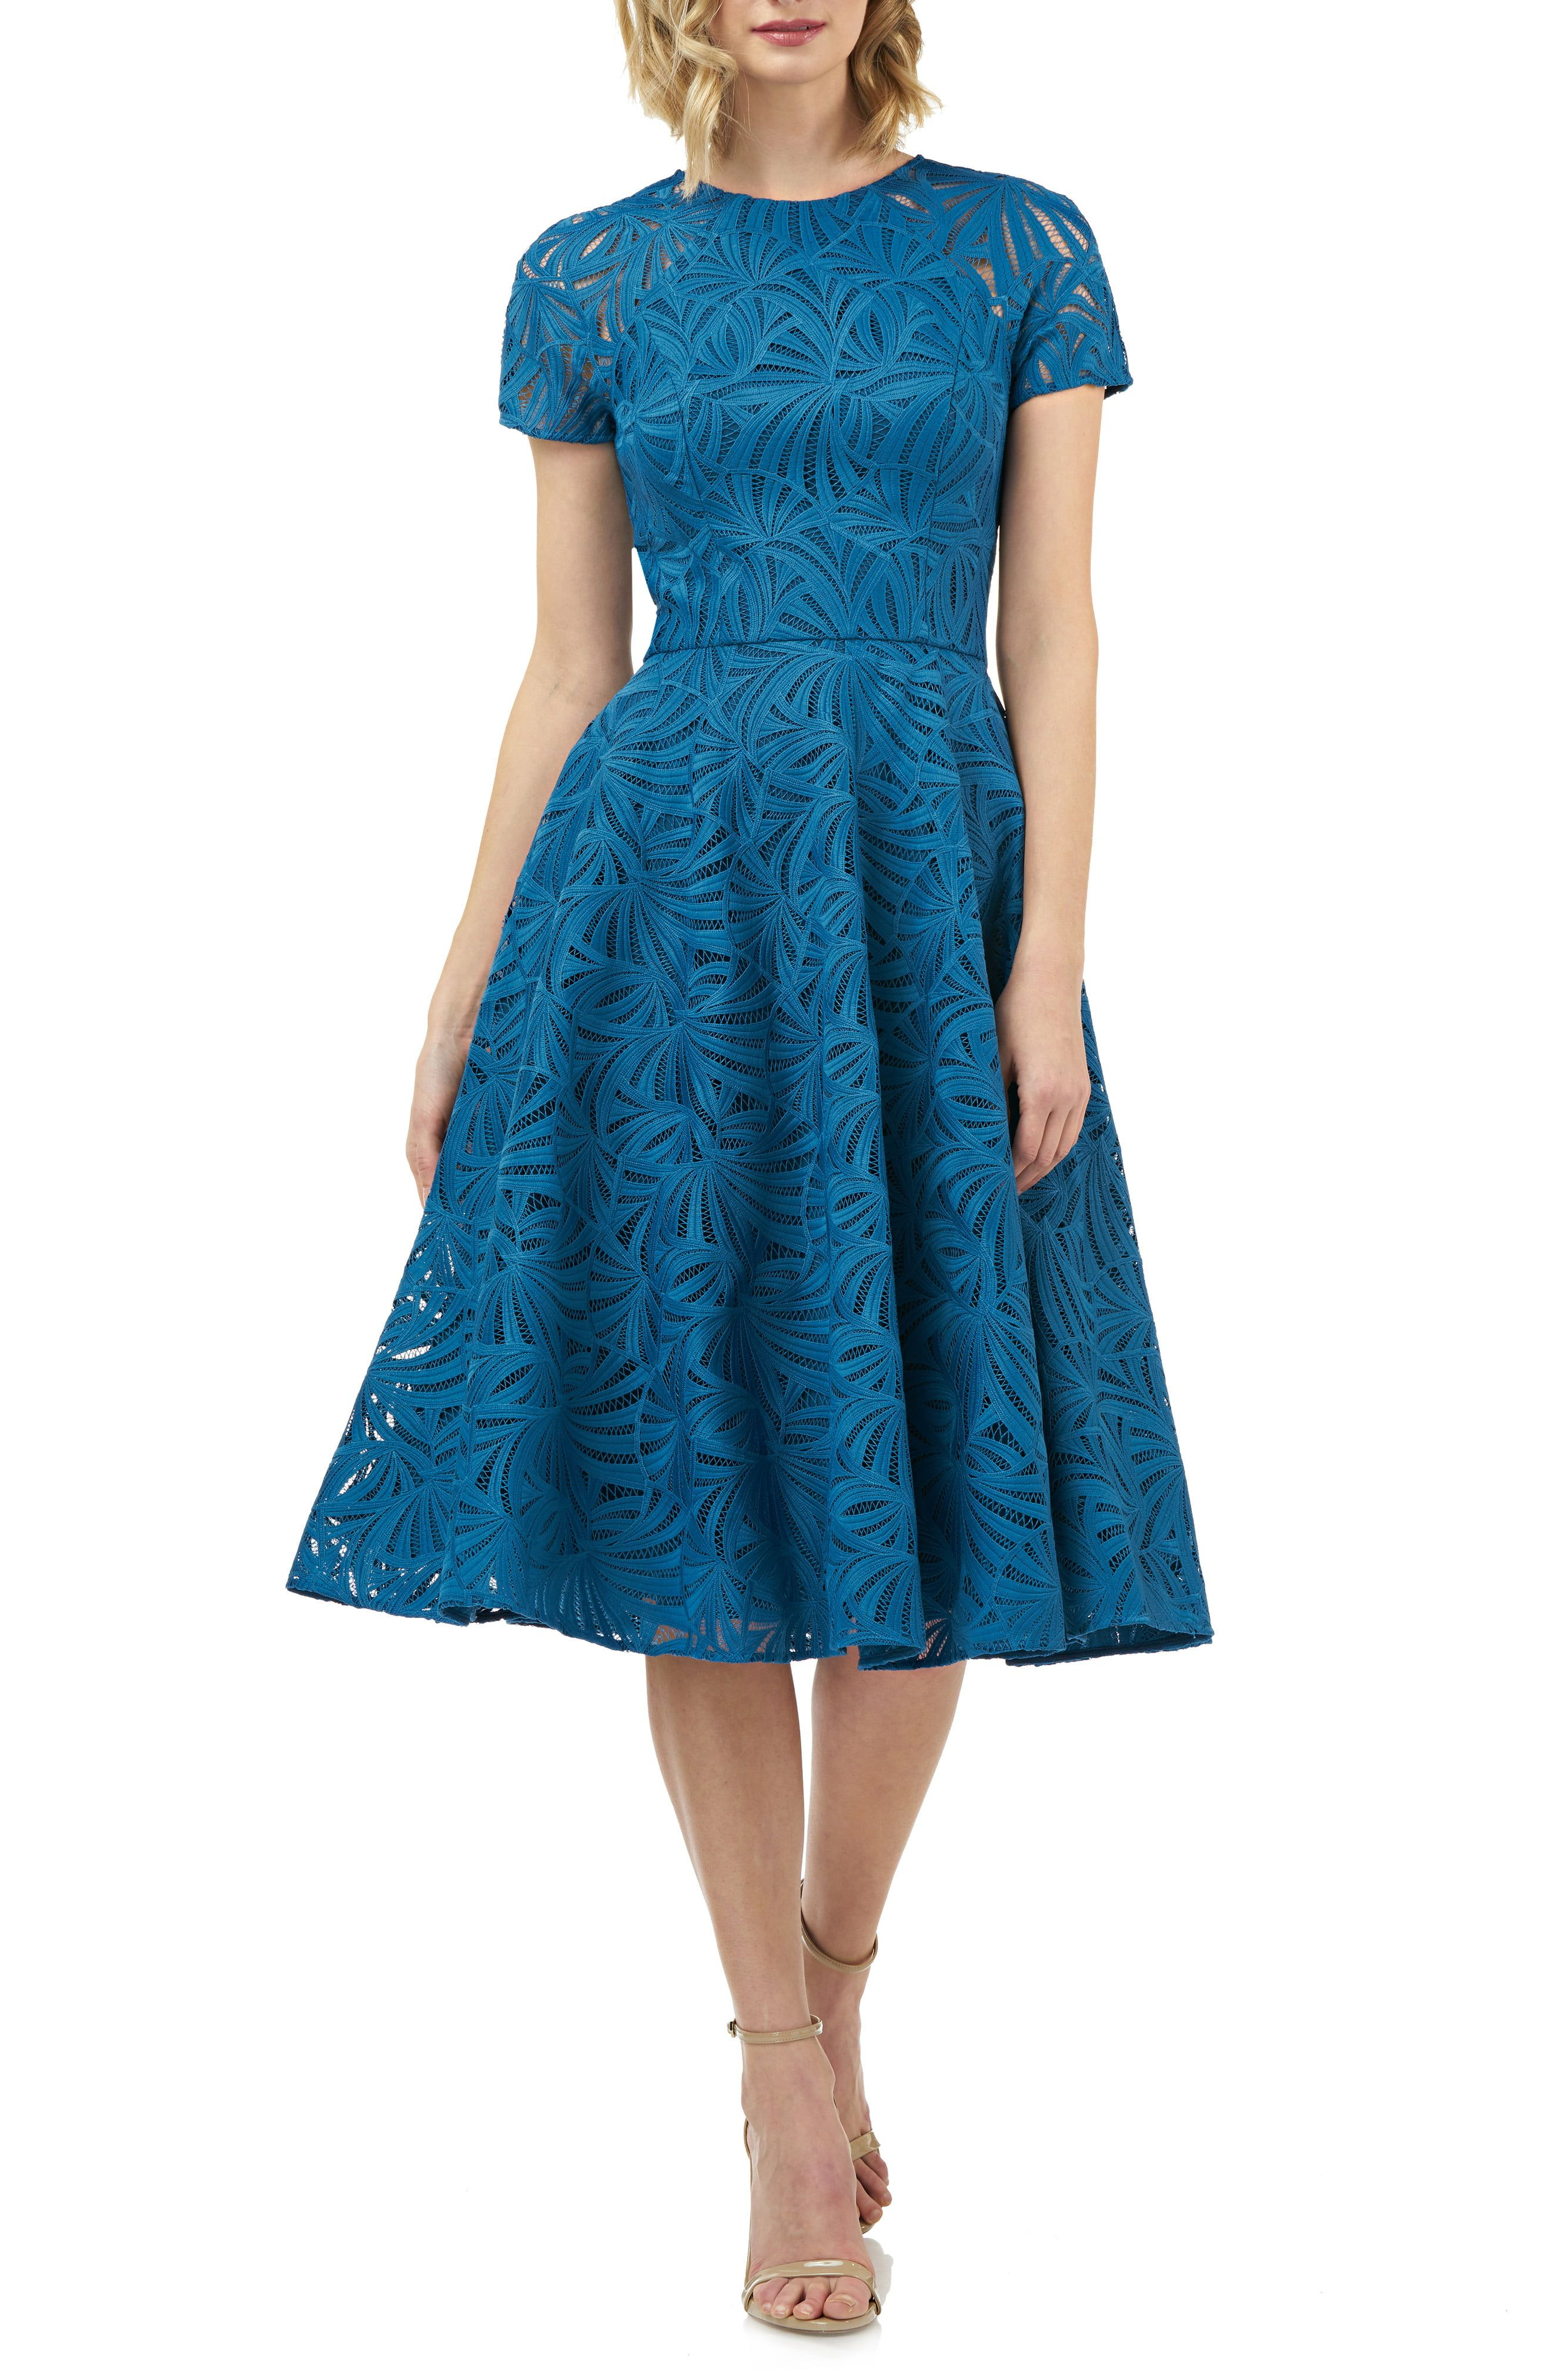 Womens Ladies Tea Rockabilly Vintage Skater Lace Long Sleeve Teal Guest Dress